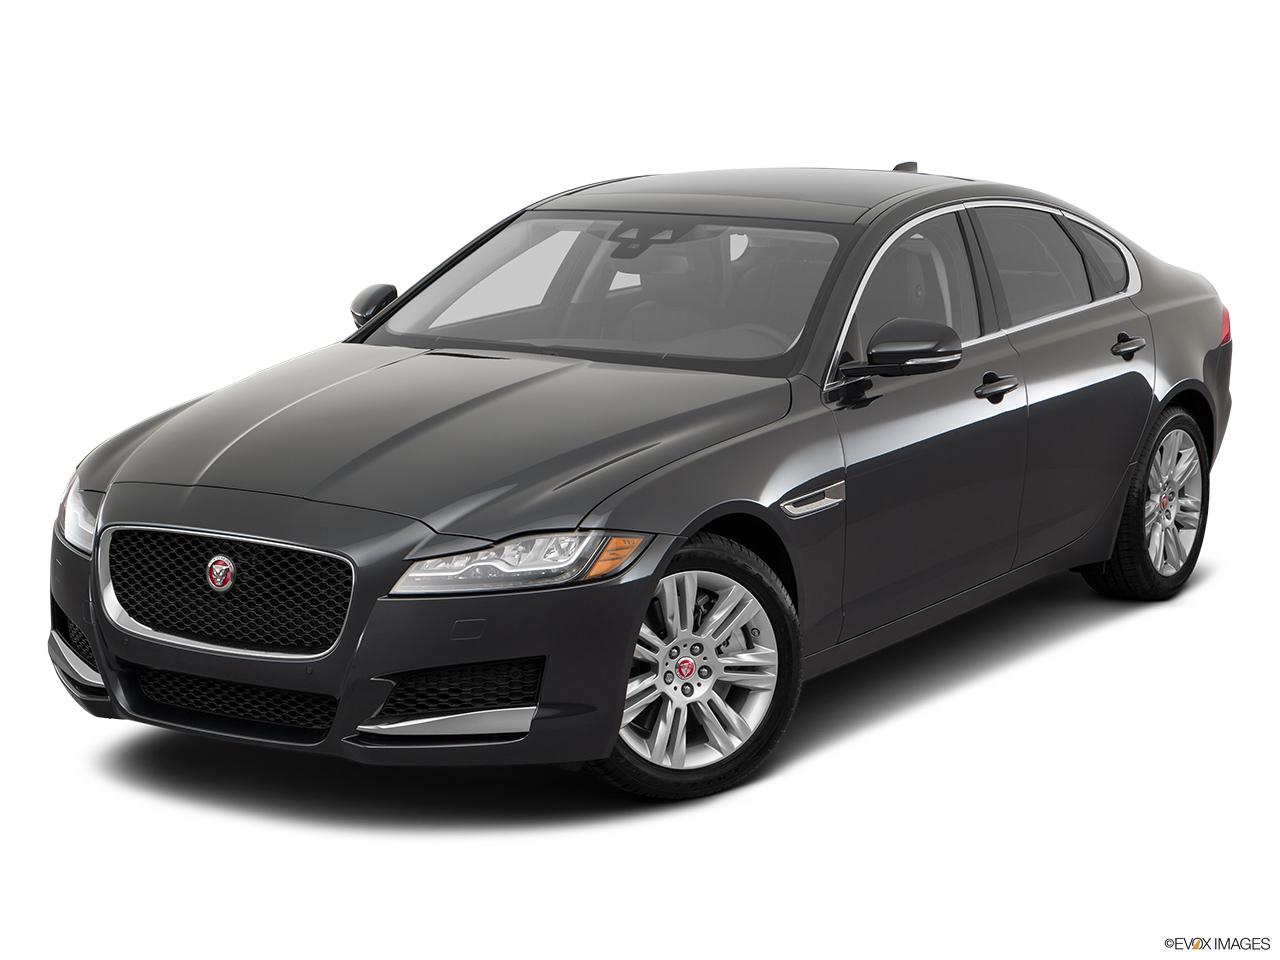 2017 jaguar xf prices in uae gulf specs reviews for dubai abu dhabi and sharjah yallamotor. Black Bedroom Furniture Sets. Home Design Ideas